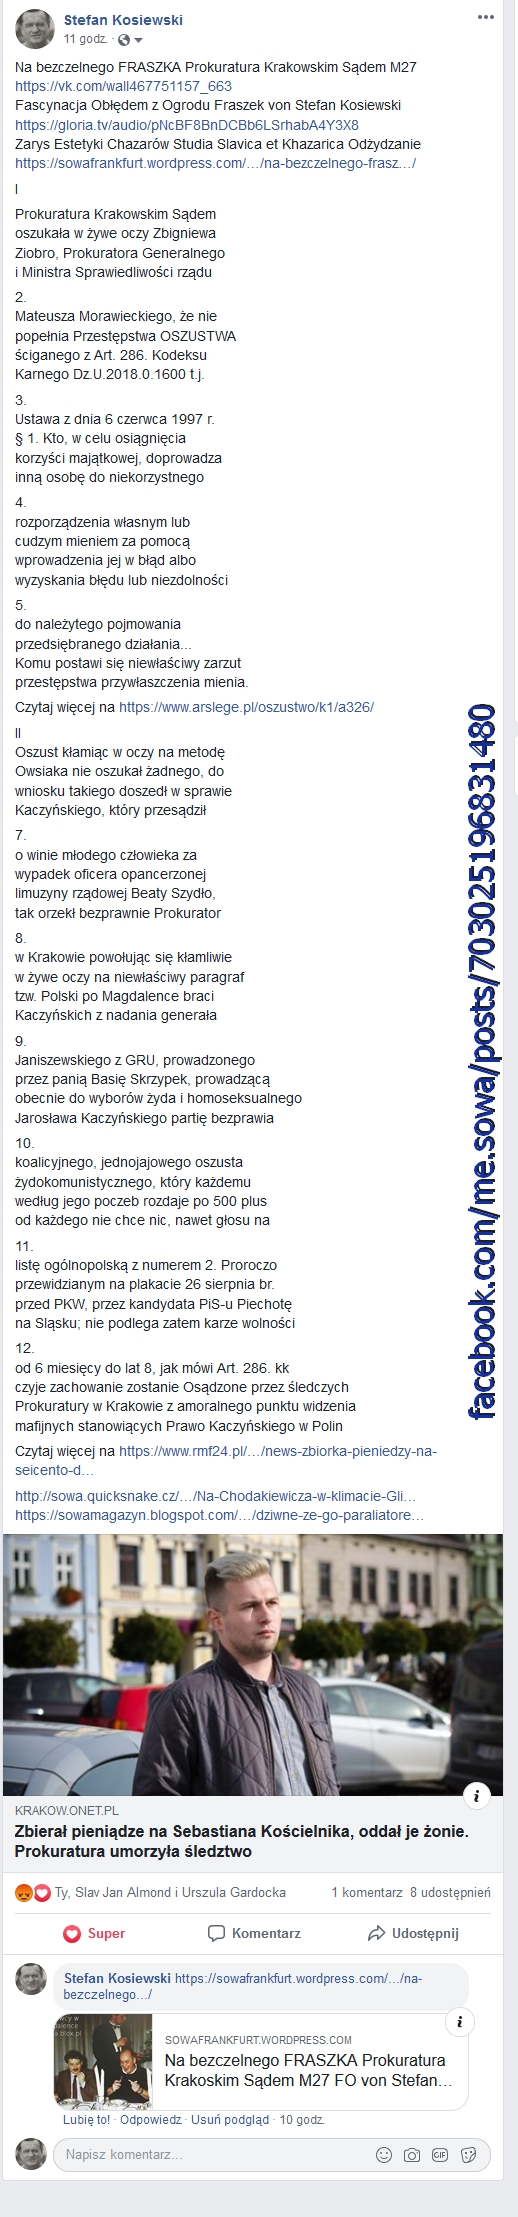 m27-screenshot_2019-09-26-na-bezczelnego-fraszka-prokuratura-krakowskim-stefan-kosiewski